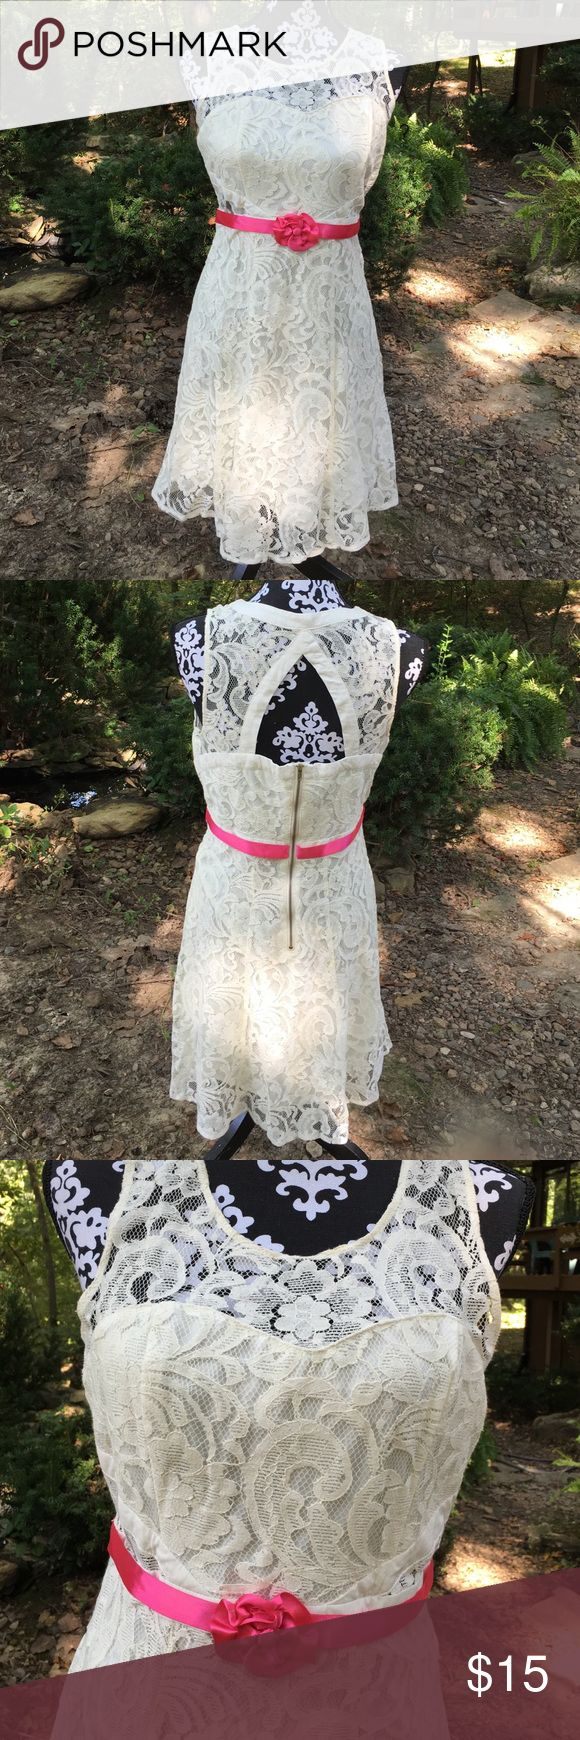 American Rag Lace Dress. Size Medium American Rag Lace Dress. Size Medium. Off white. American Rag Dresses Midi